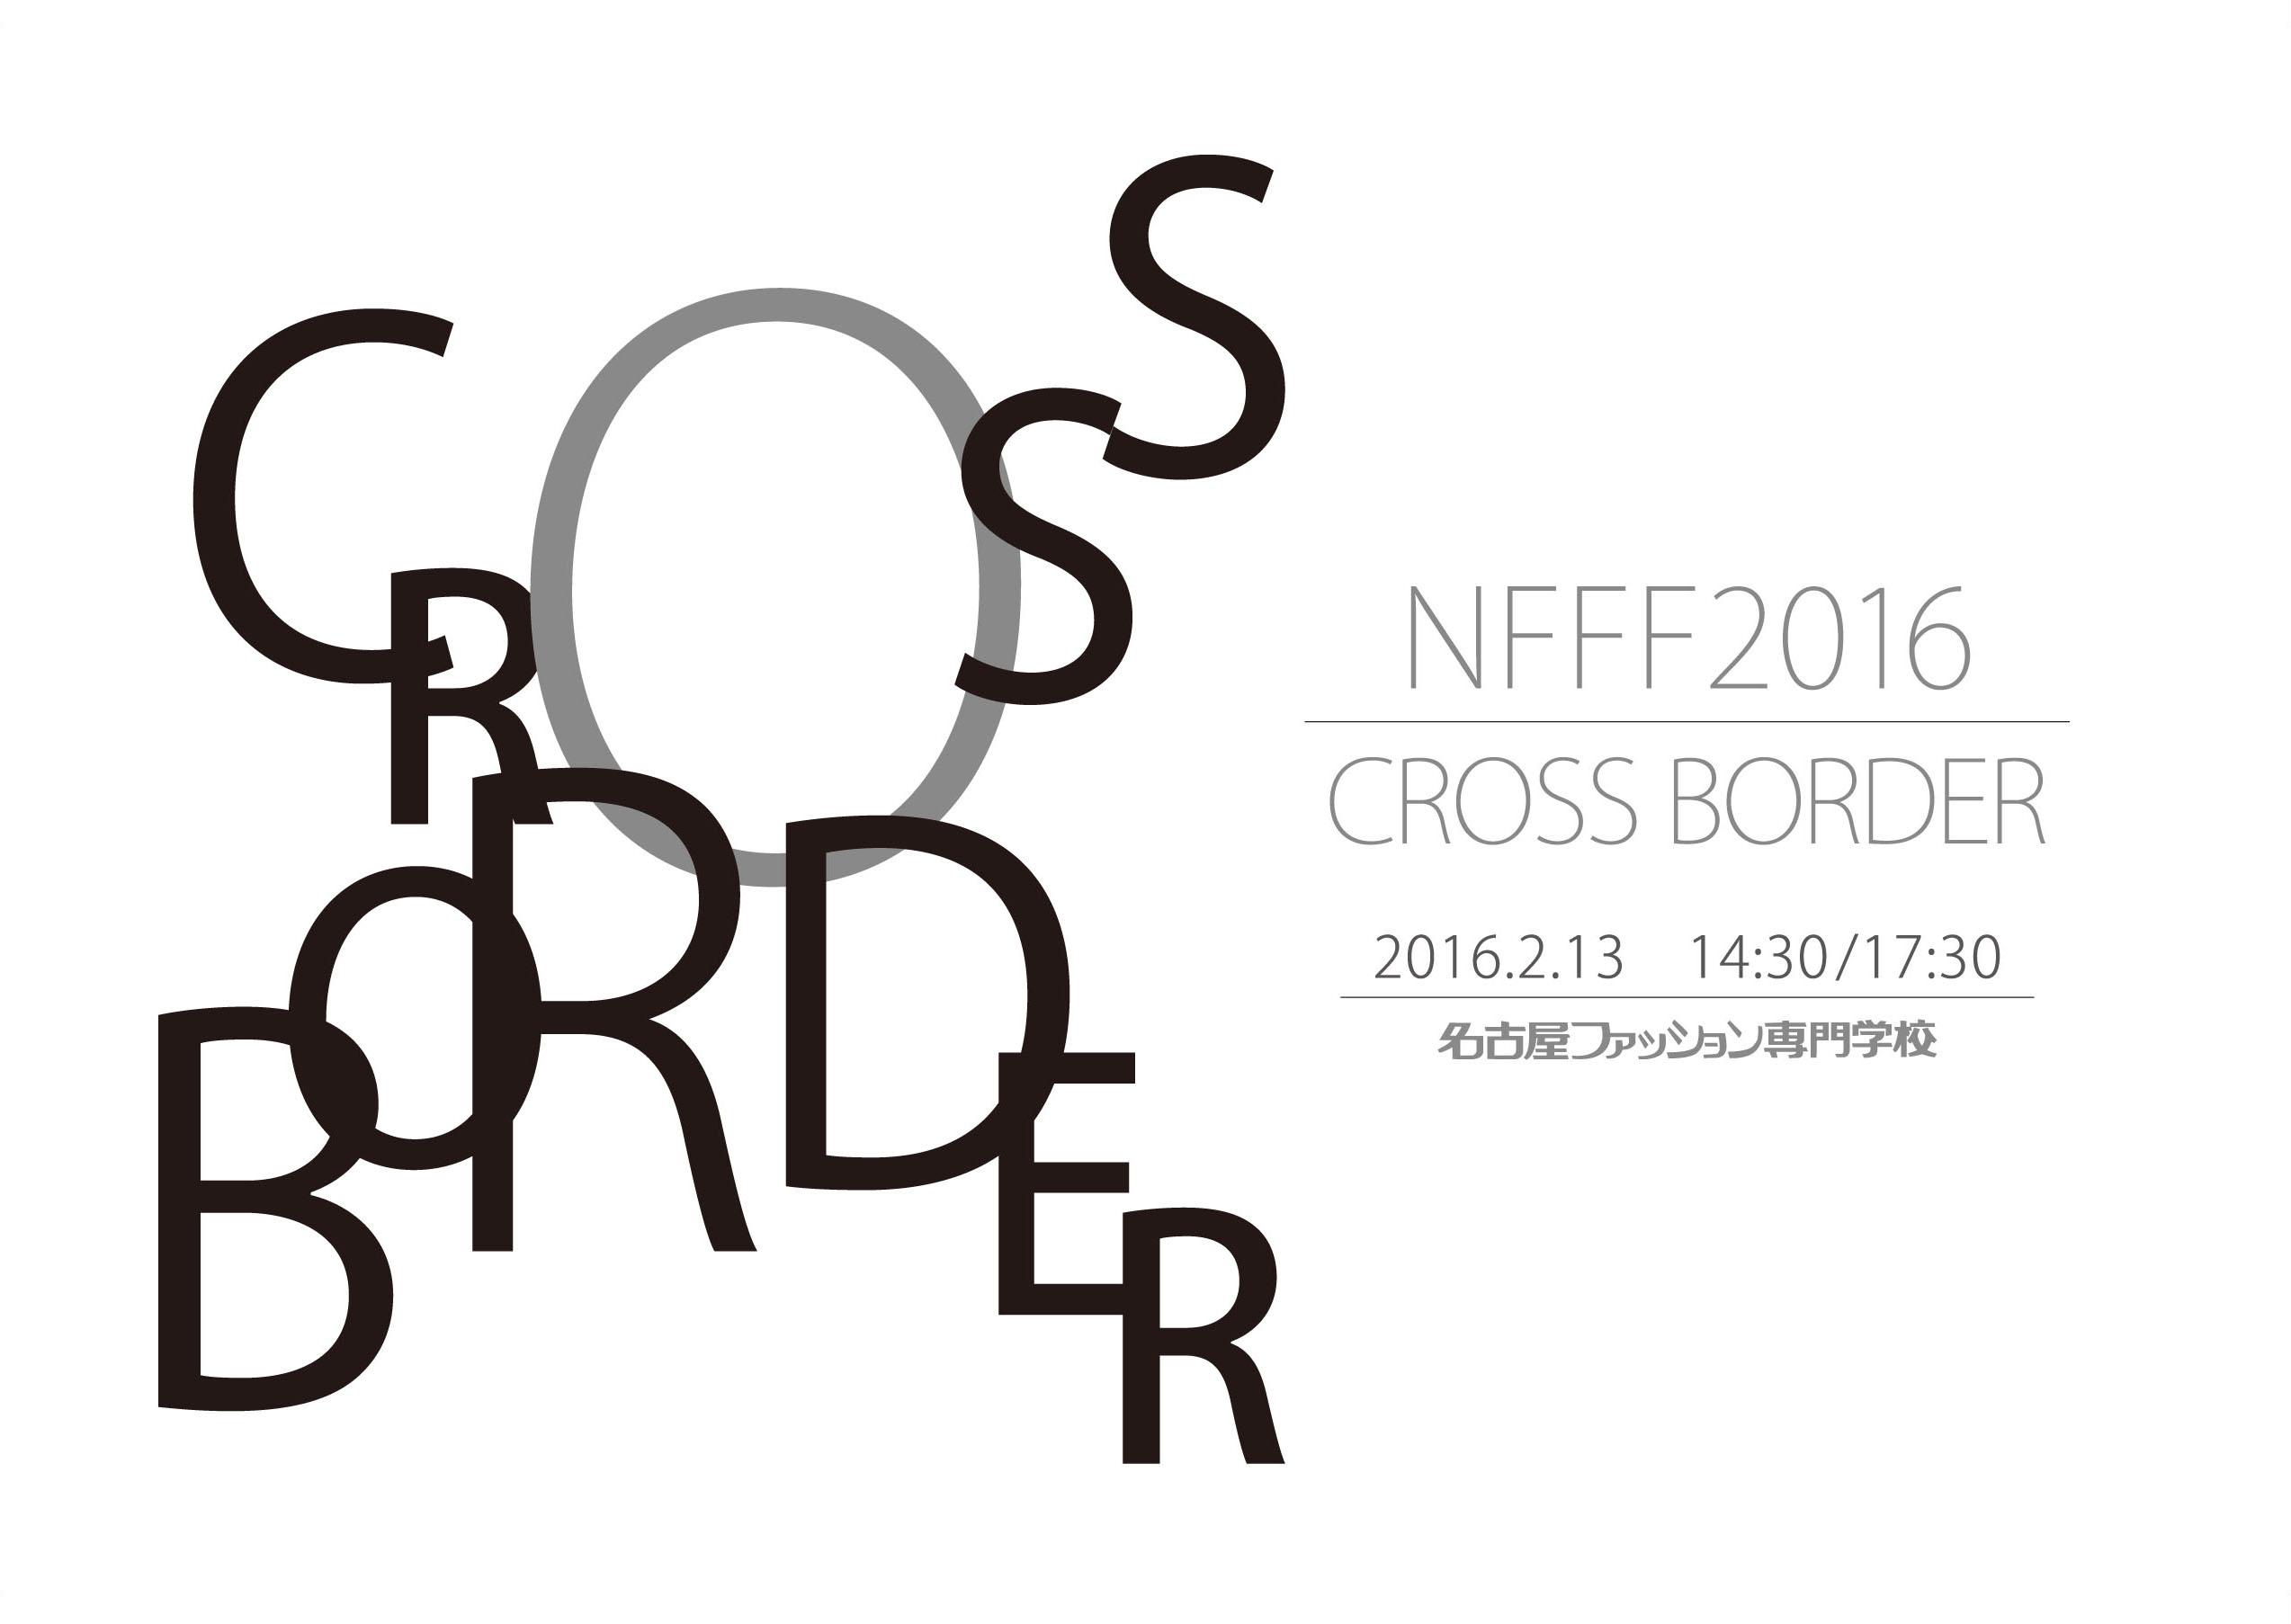 NFFF2016にご来場ありがとうございました。_b0110019_1015182.jpg